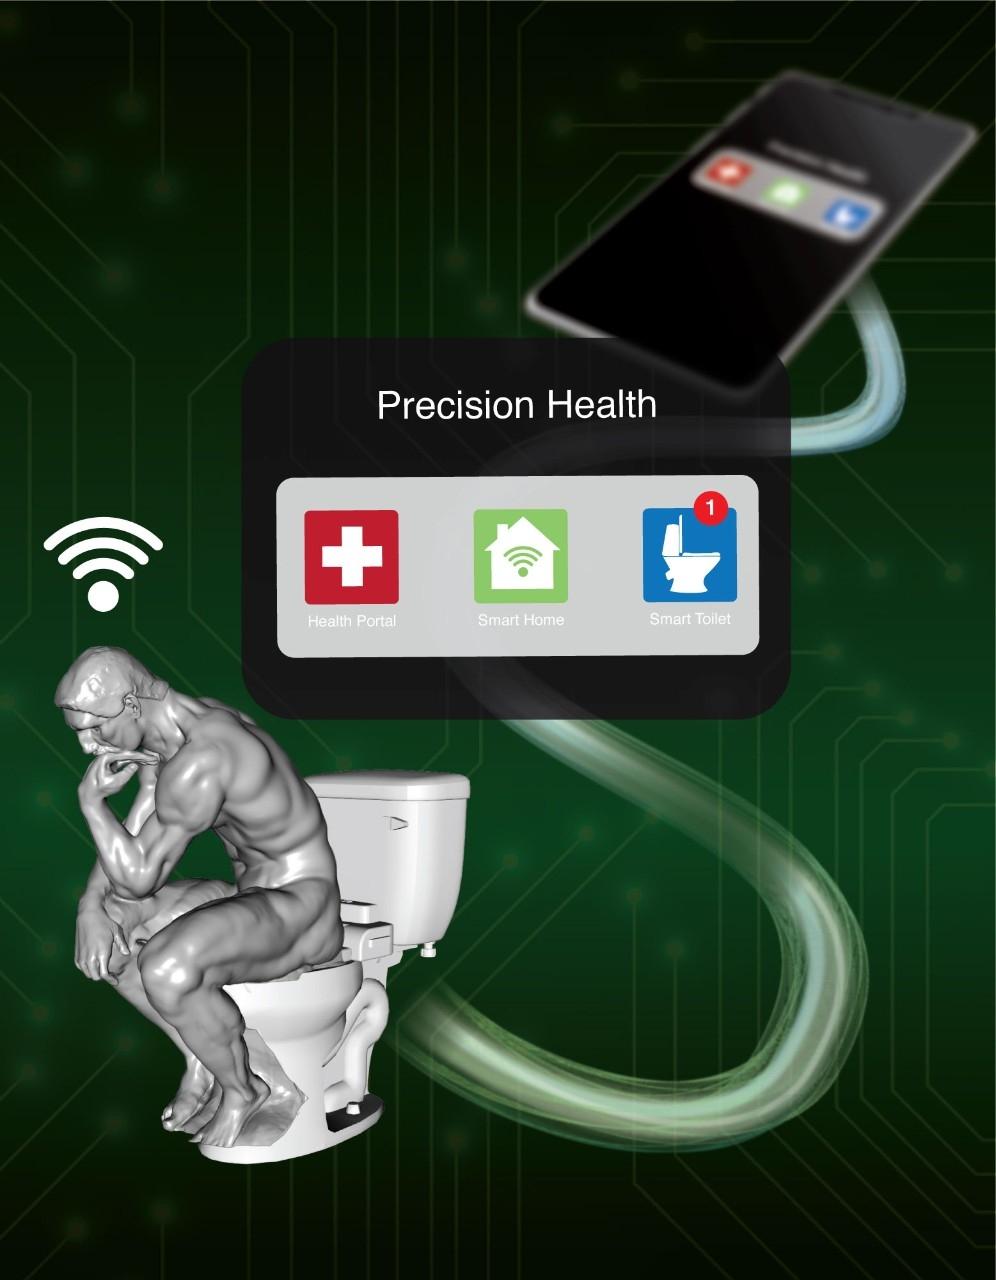 Smart Toilet (Sanjiv « Sam » Gambhir)